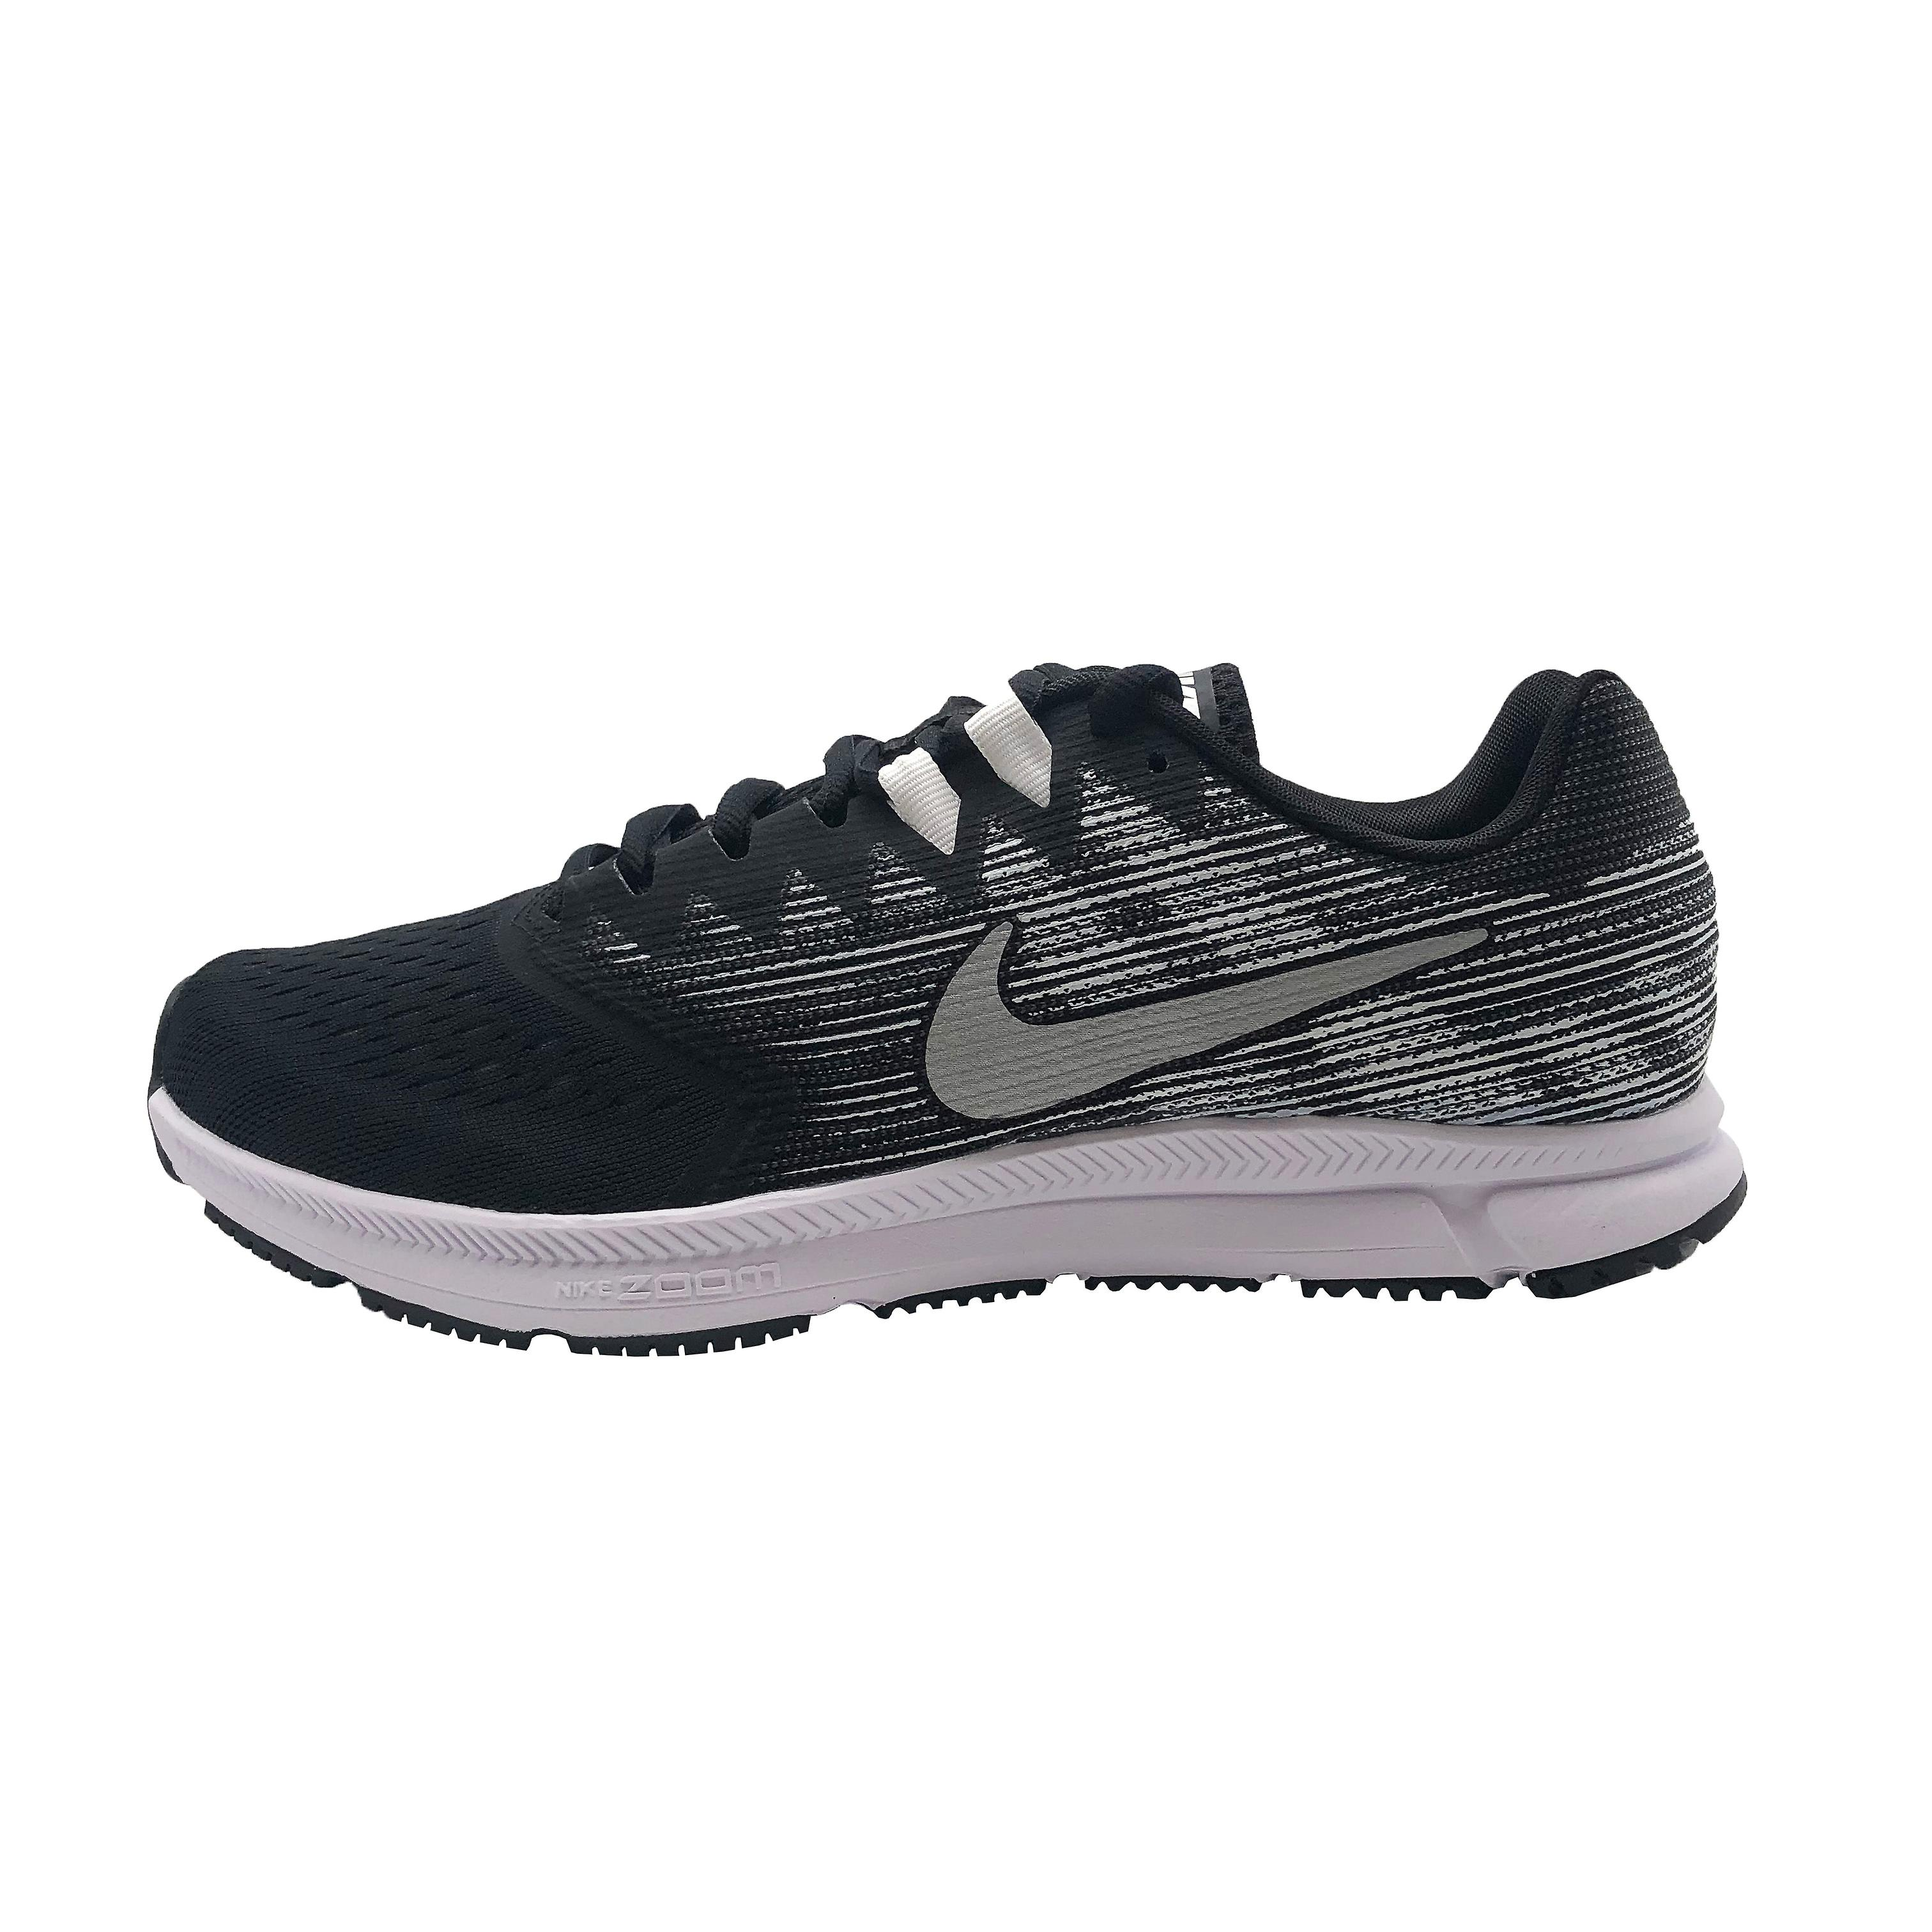 big sale b0d46 8e005 Nike Zoom Span 2 908990 001 Mens Trainers